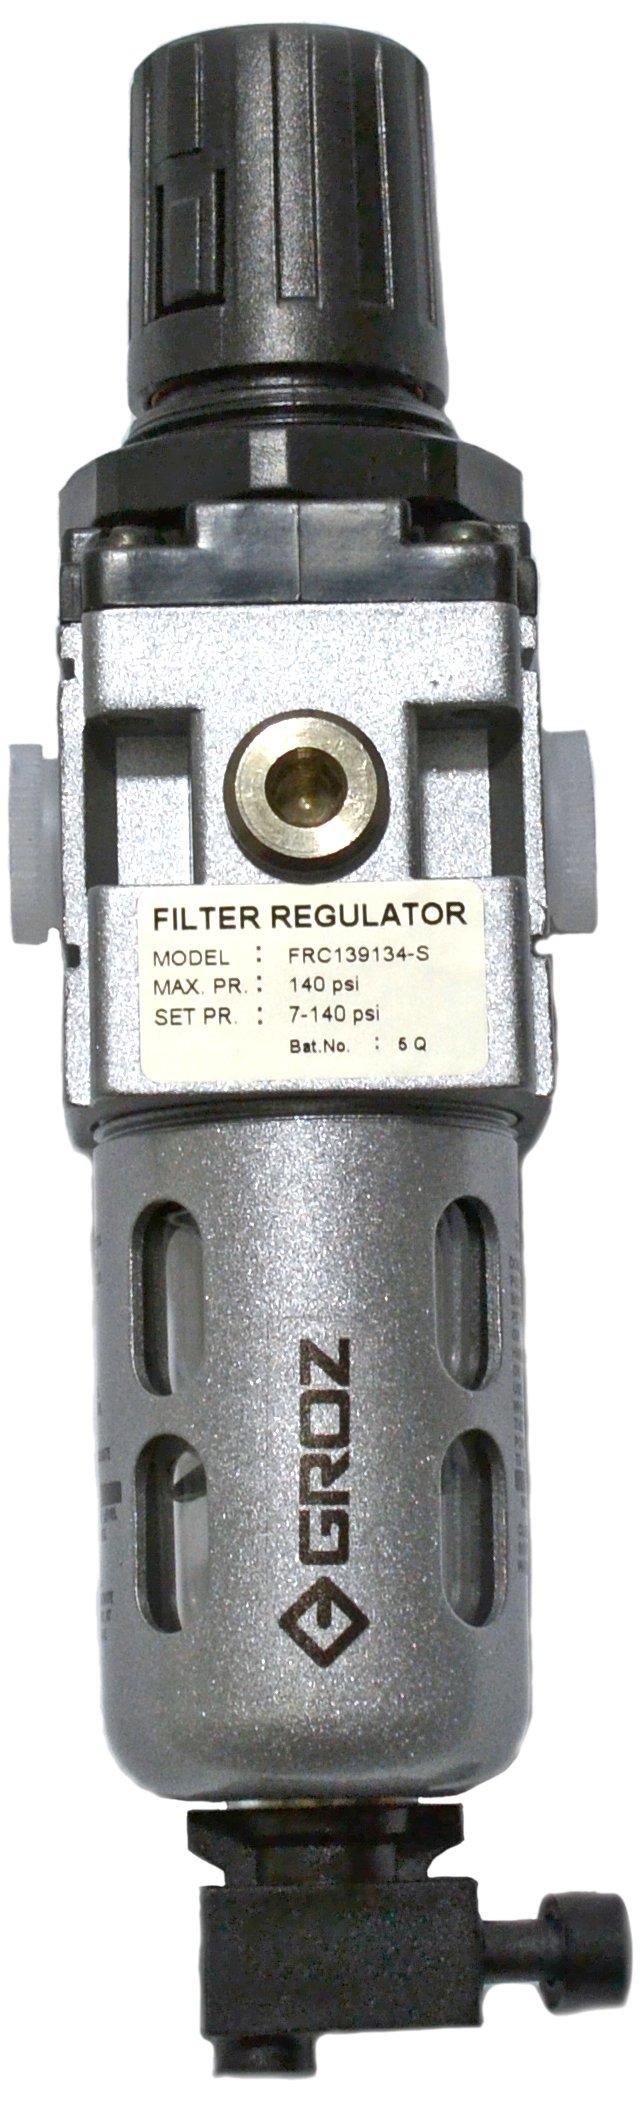 GROZ ¼'' NPT Miniature Air Filter-Regulator Combination  Polycarbonate Bowl   20 CFM Max Flow Rate   145 PSI Max Pressure (60351) by Groz